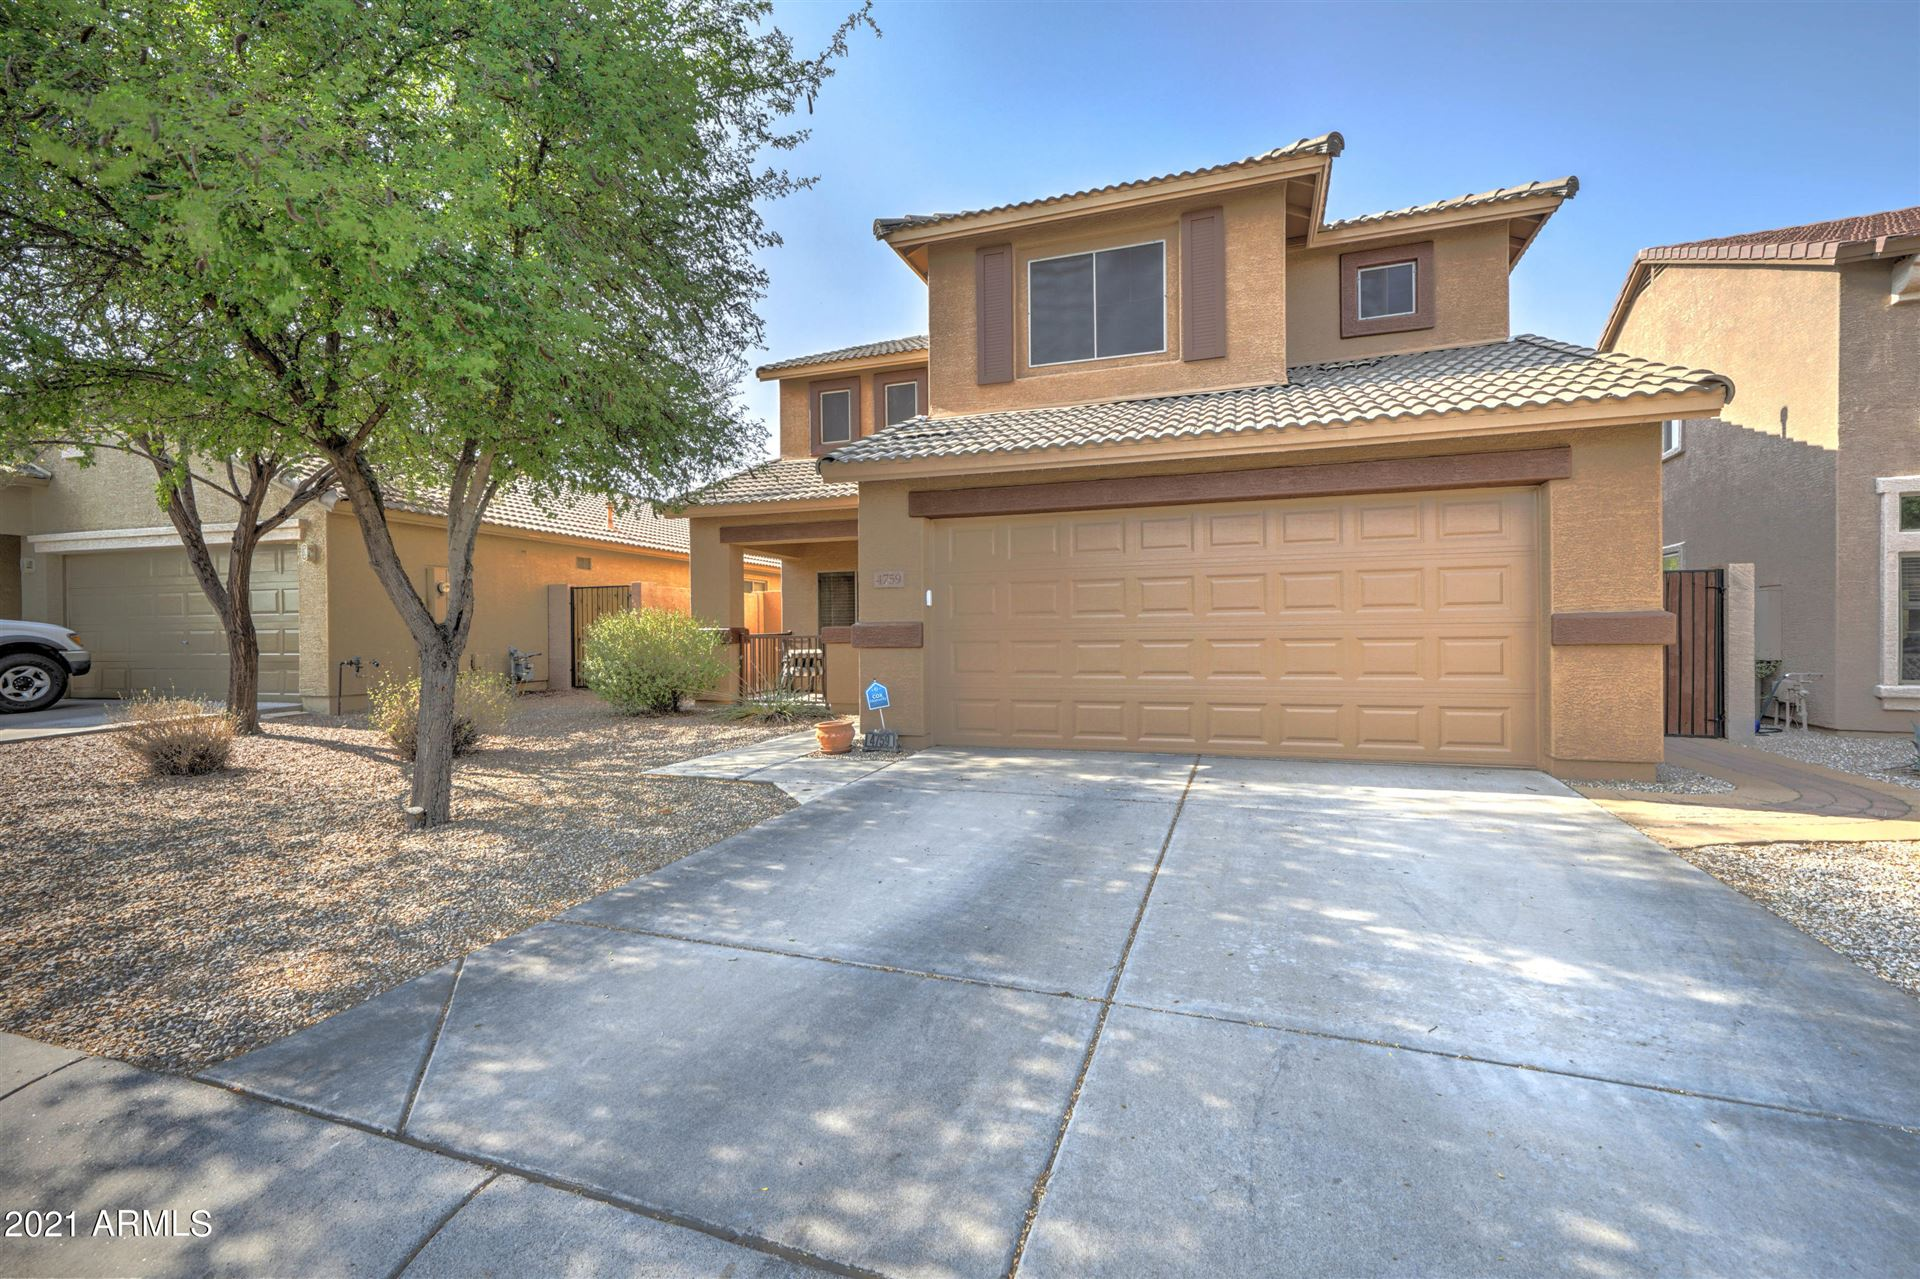 Photo of 4759 E WOBURN Lane, Cave Creek, AZ 85331 (MLS # 6265239)